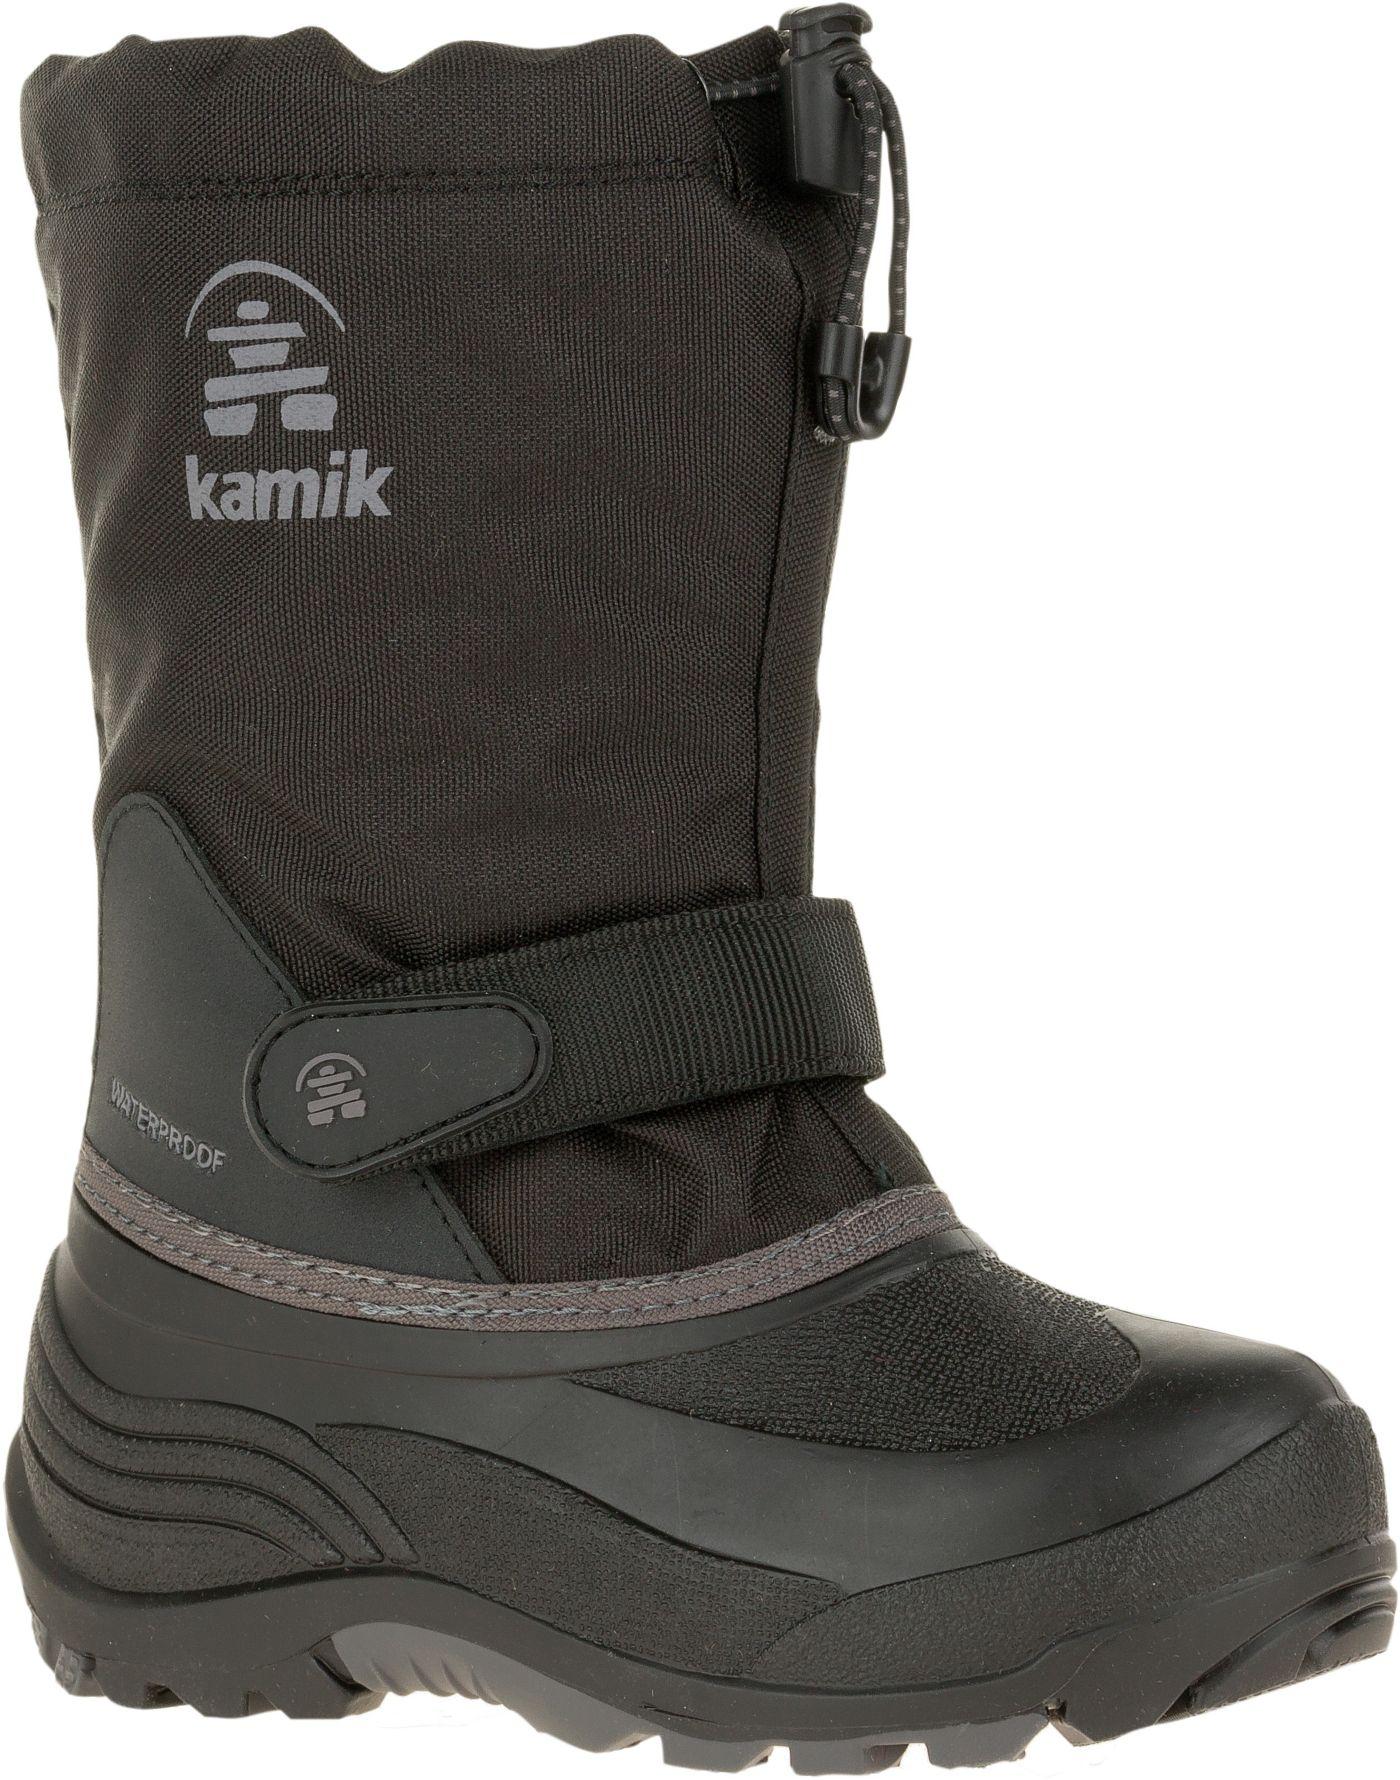 Kamik Kids' Waterbug5 Insulated Waterproof Winter Boots